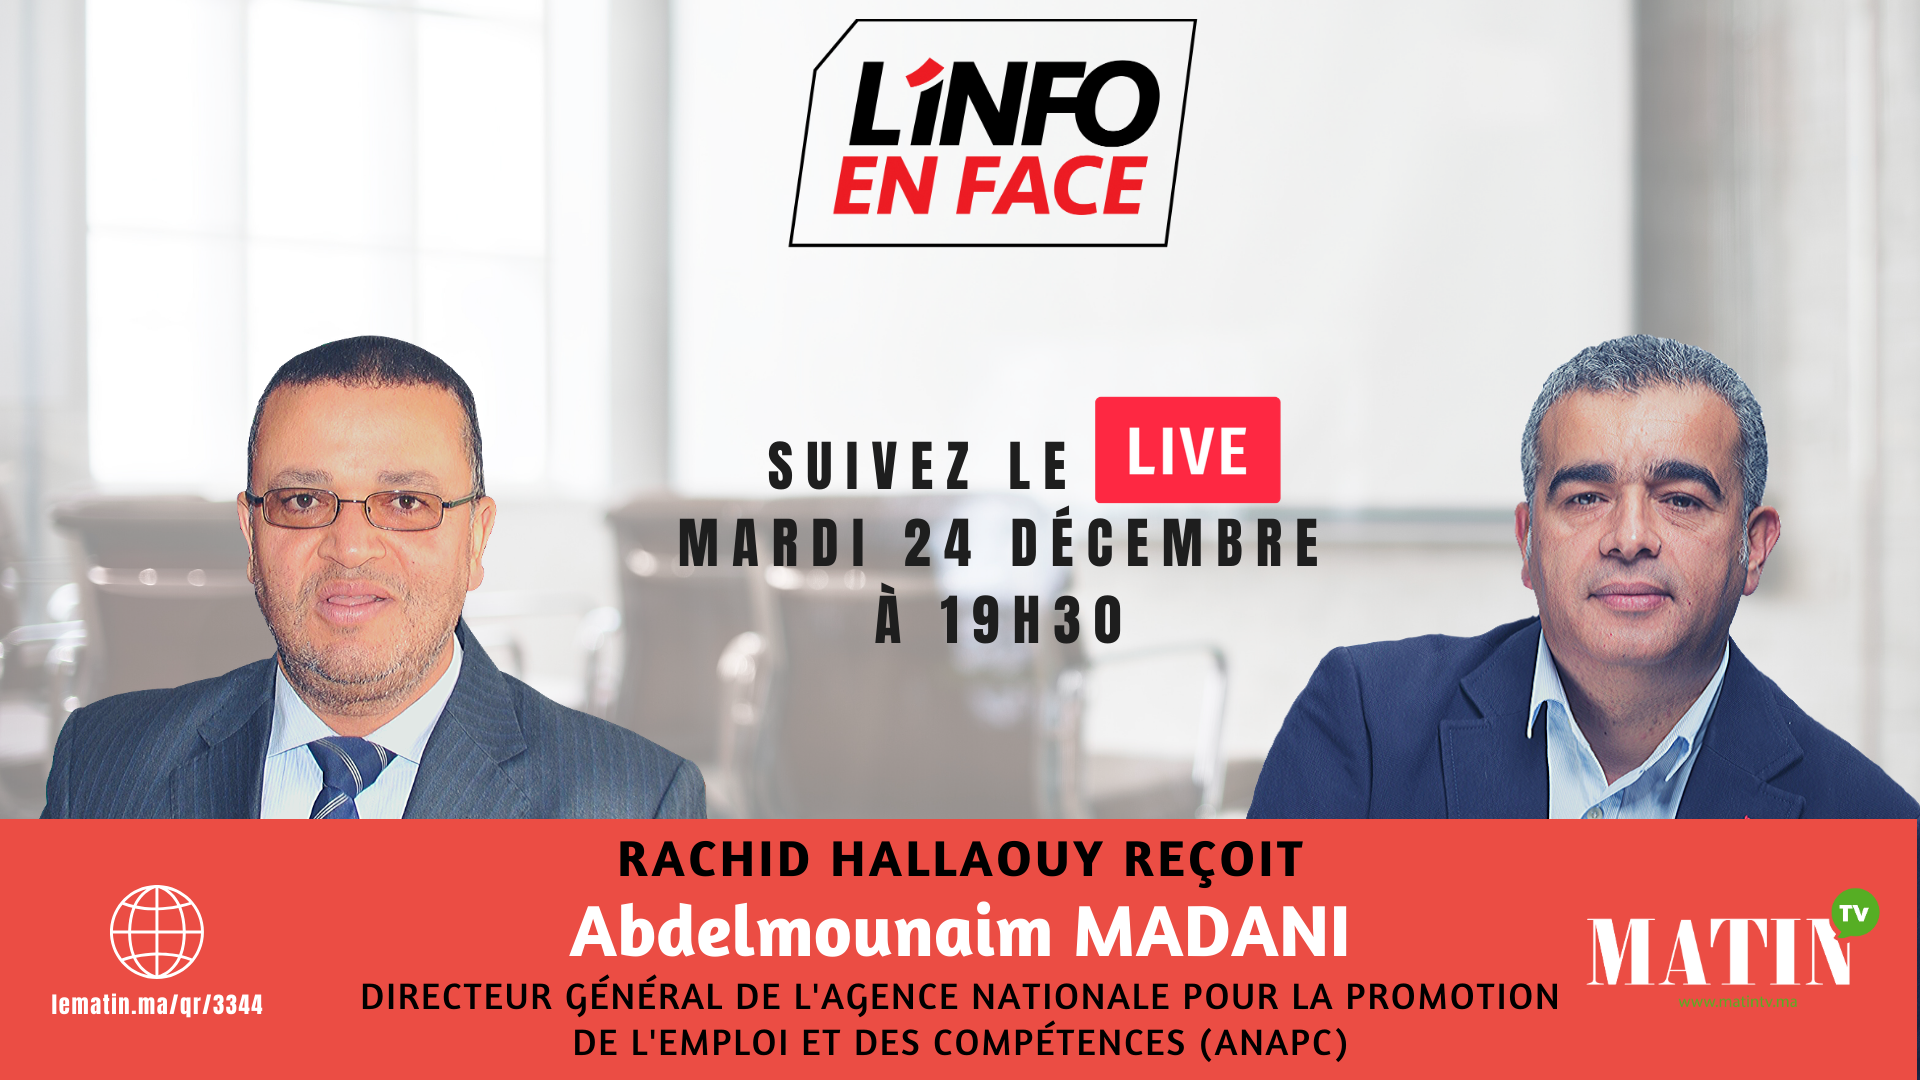 Live : L'Info en Face spécial CNRA avec Abdelmounaim Madani